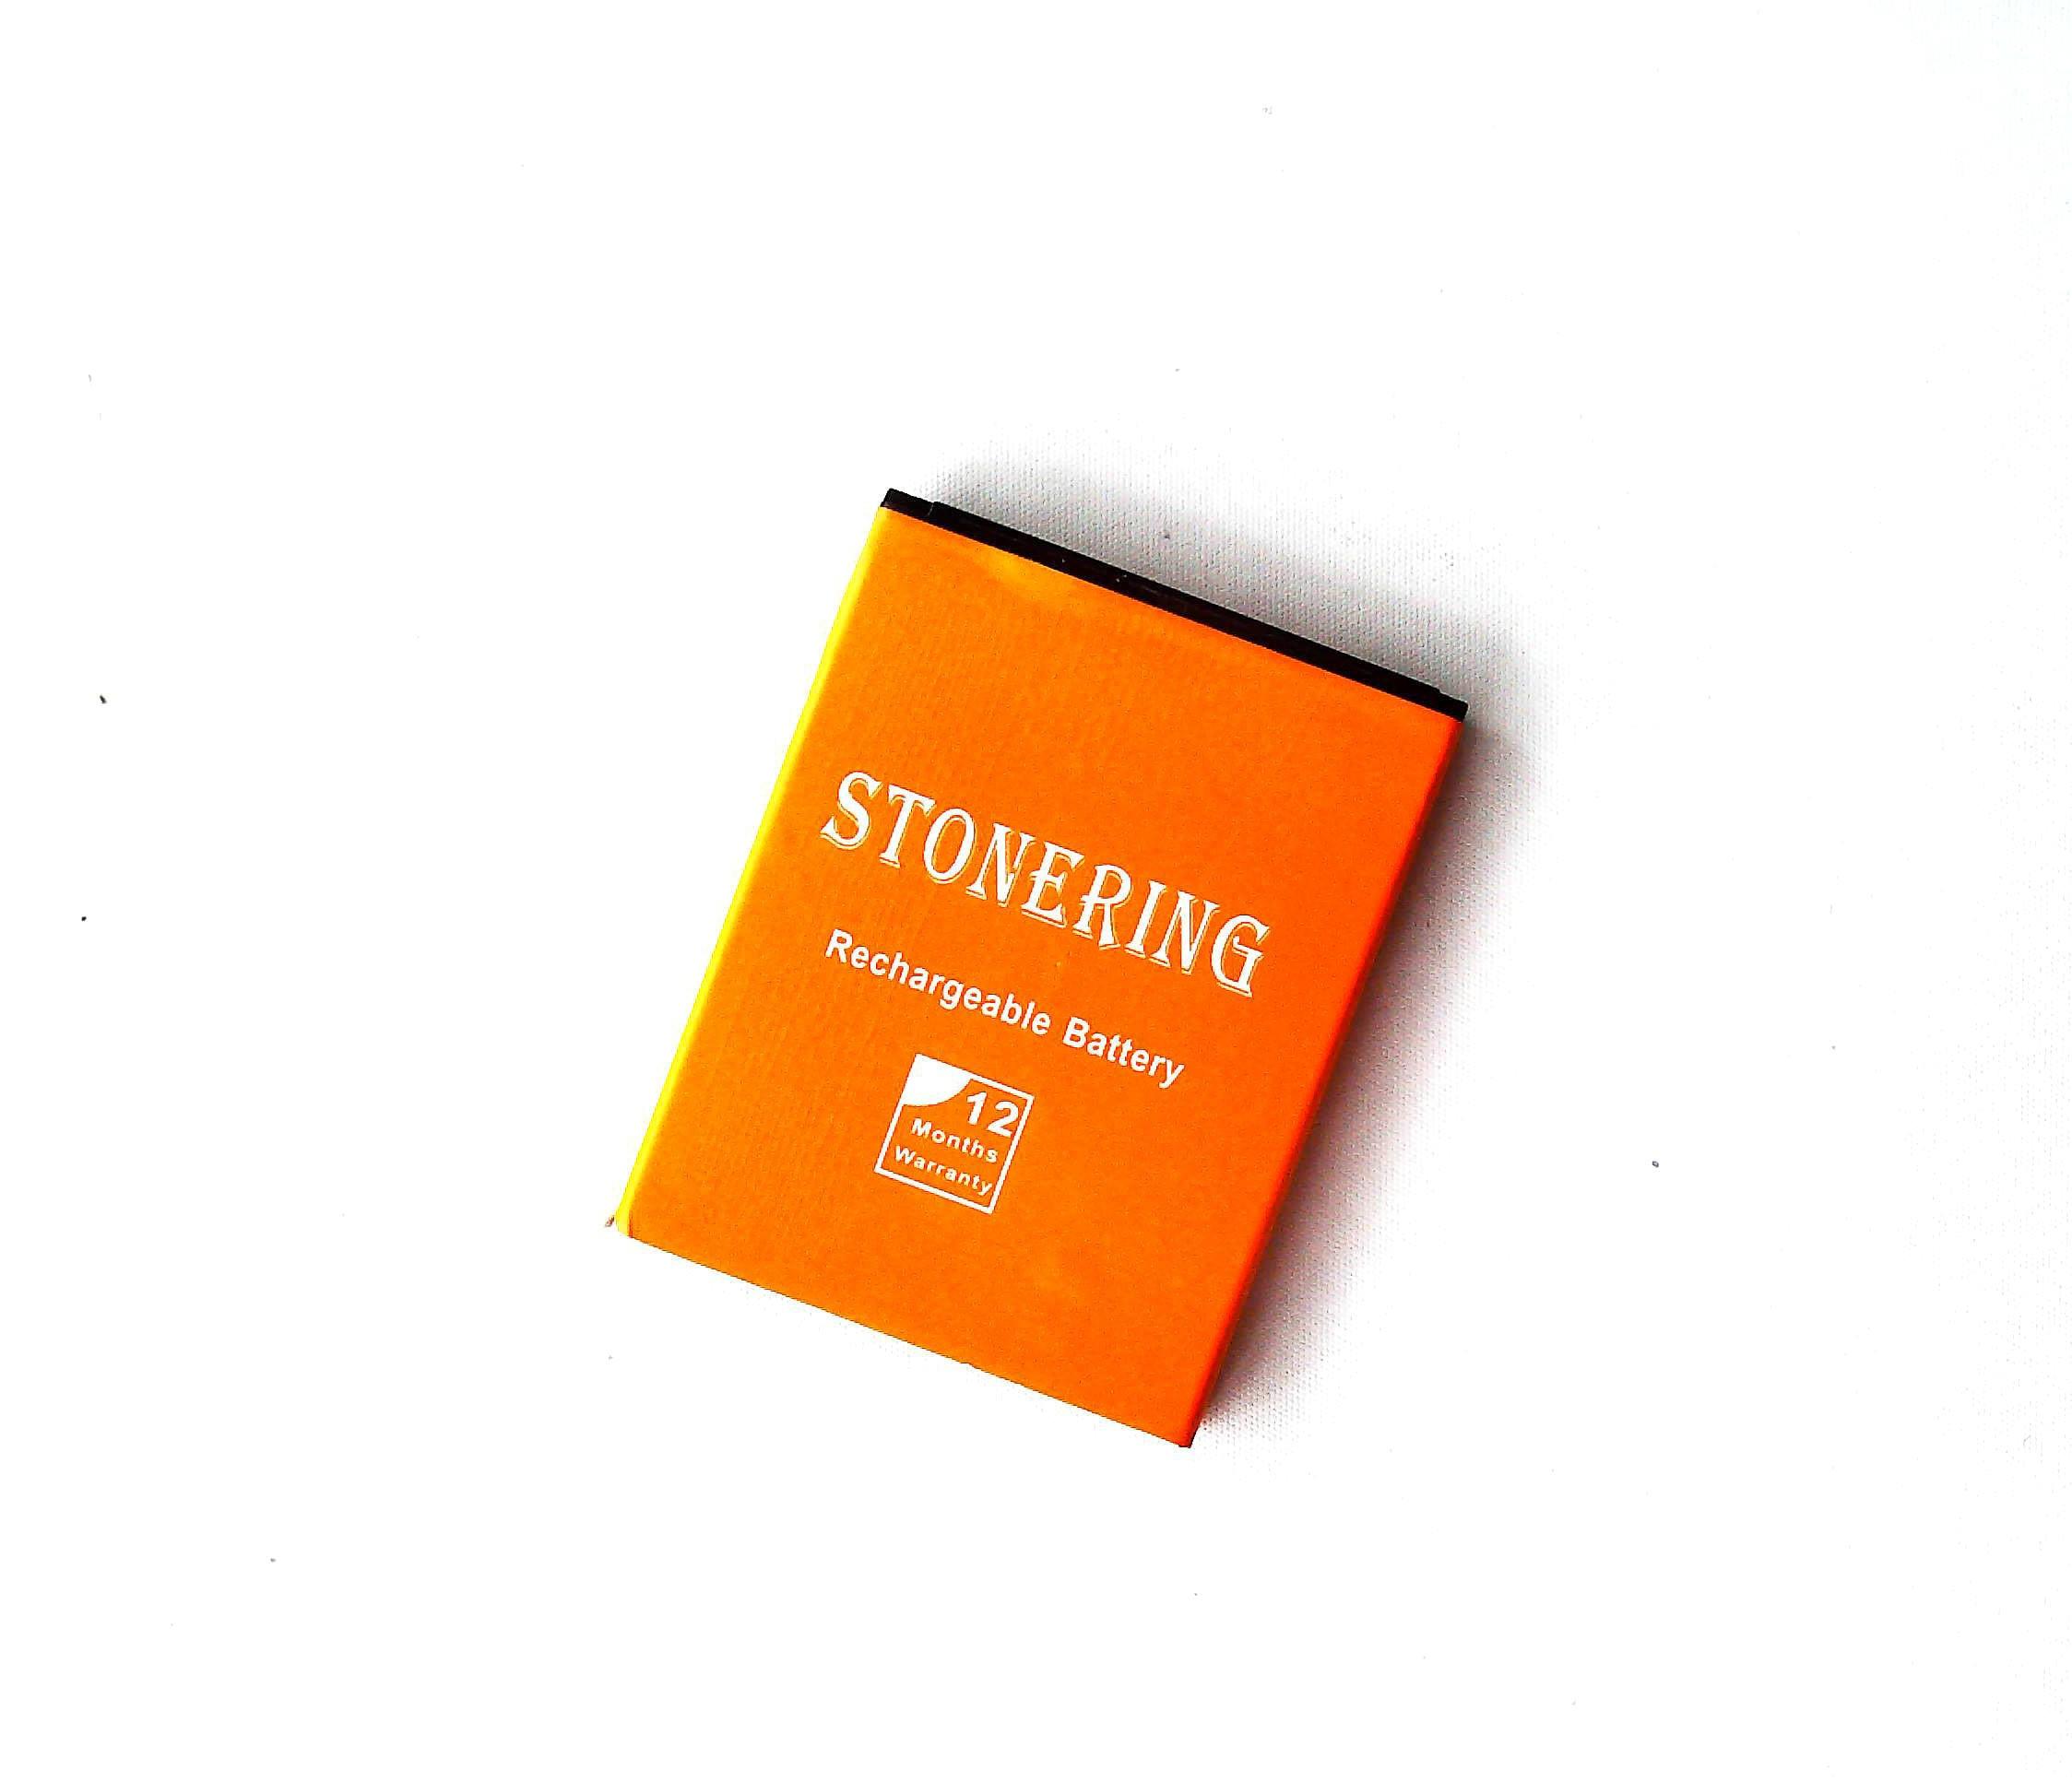 1500mAh EP500 batería para Sony Ericsson Xperia ST17I ST15I SK17I WT18I X8 U5I E15i wt18i wt19i U8 teléfono móvil